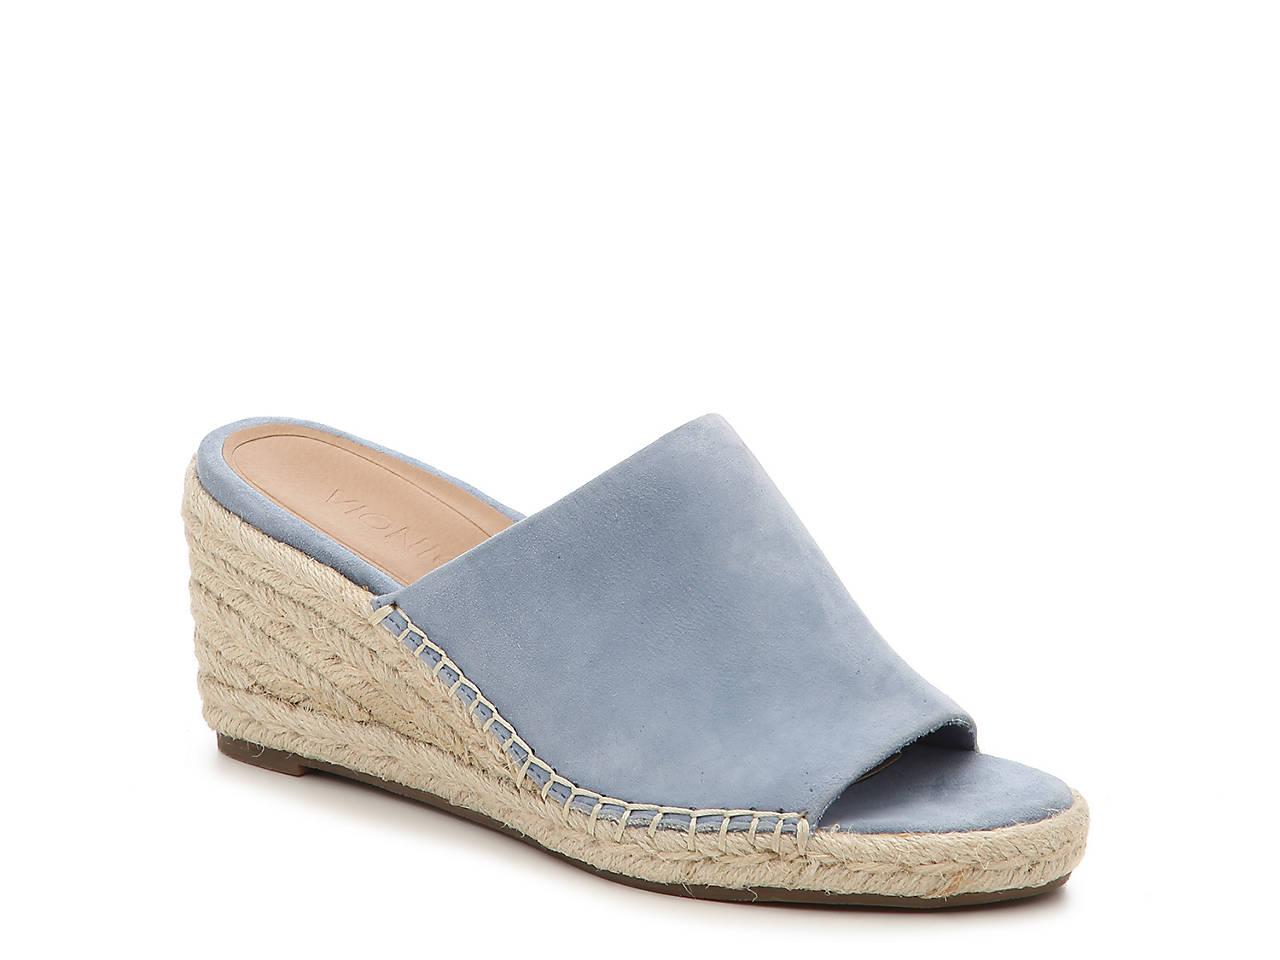 4e313bad94f6 Vionic Kadyn Espadrille Wedge Sandal Women s Shoes